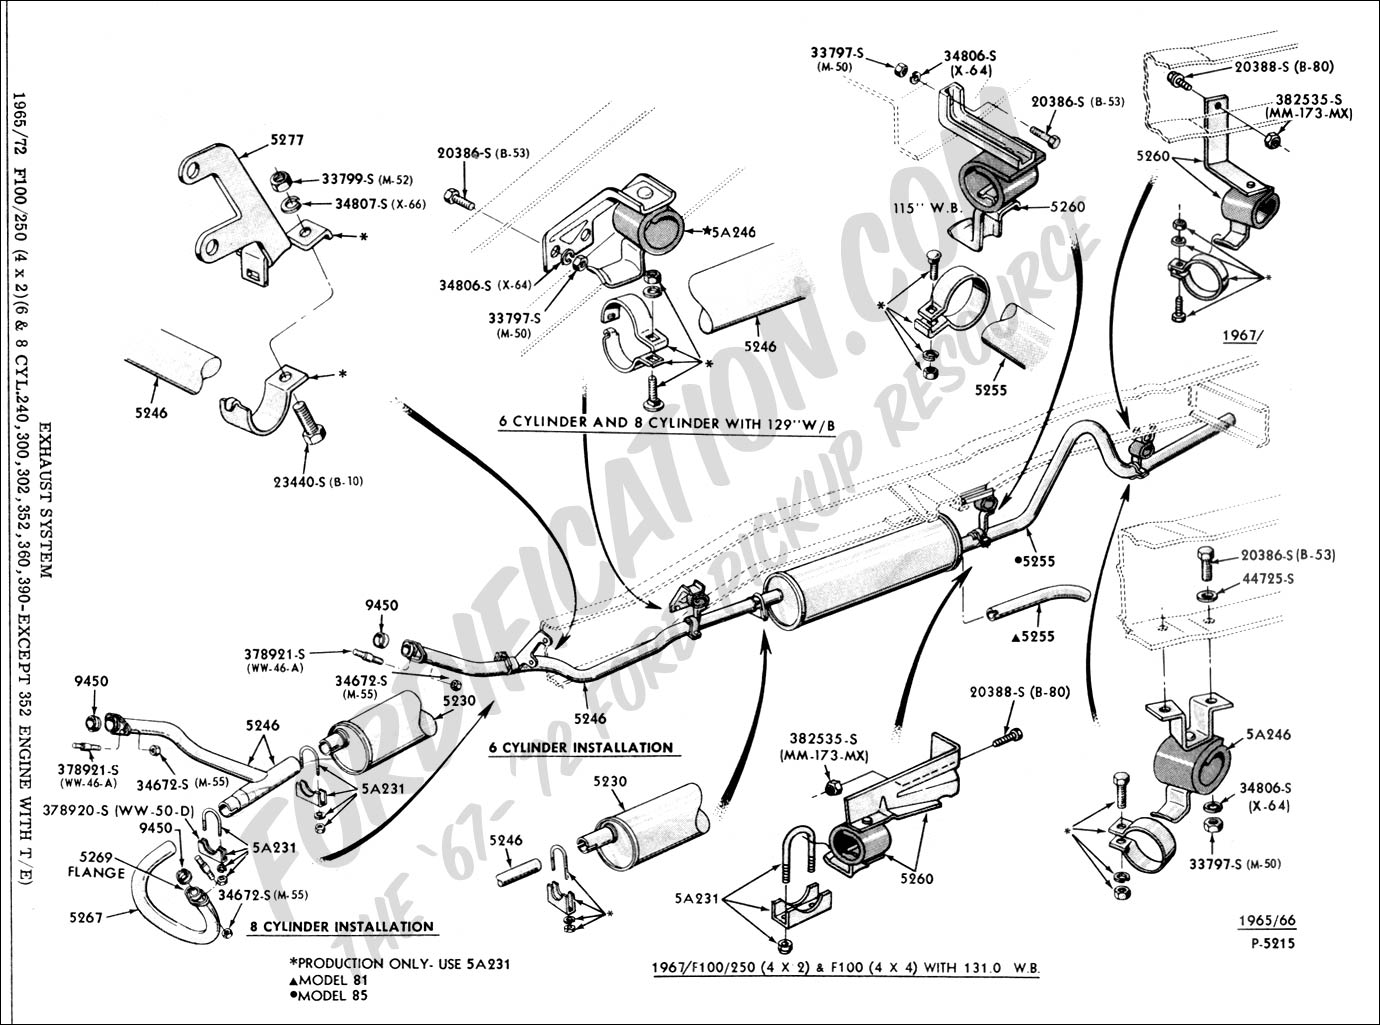 2000 Ford F150 Exhaust Manifold Diagram Wiring Diagram Center Nut Shine A Nut Shine A Tatikids It